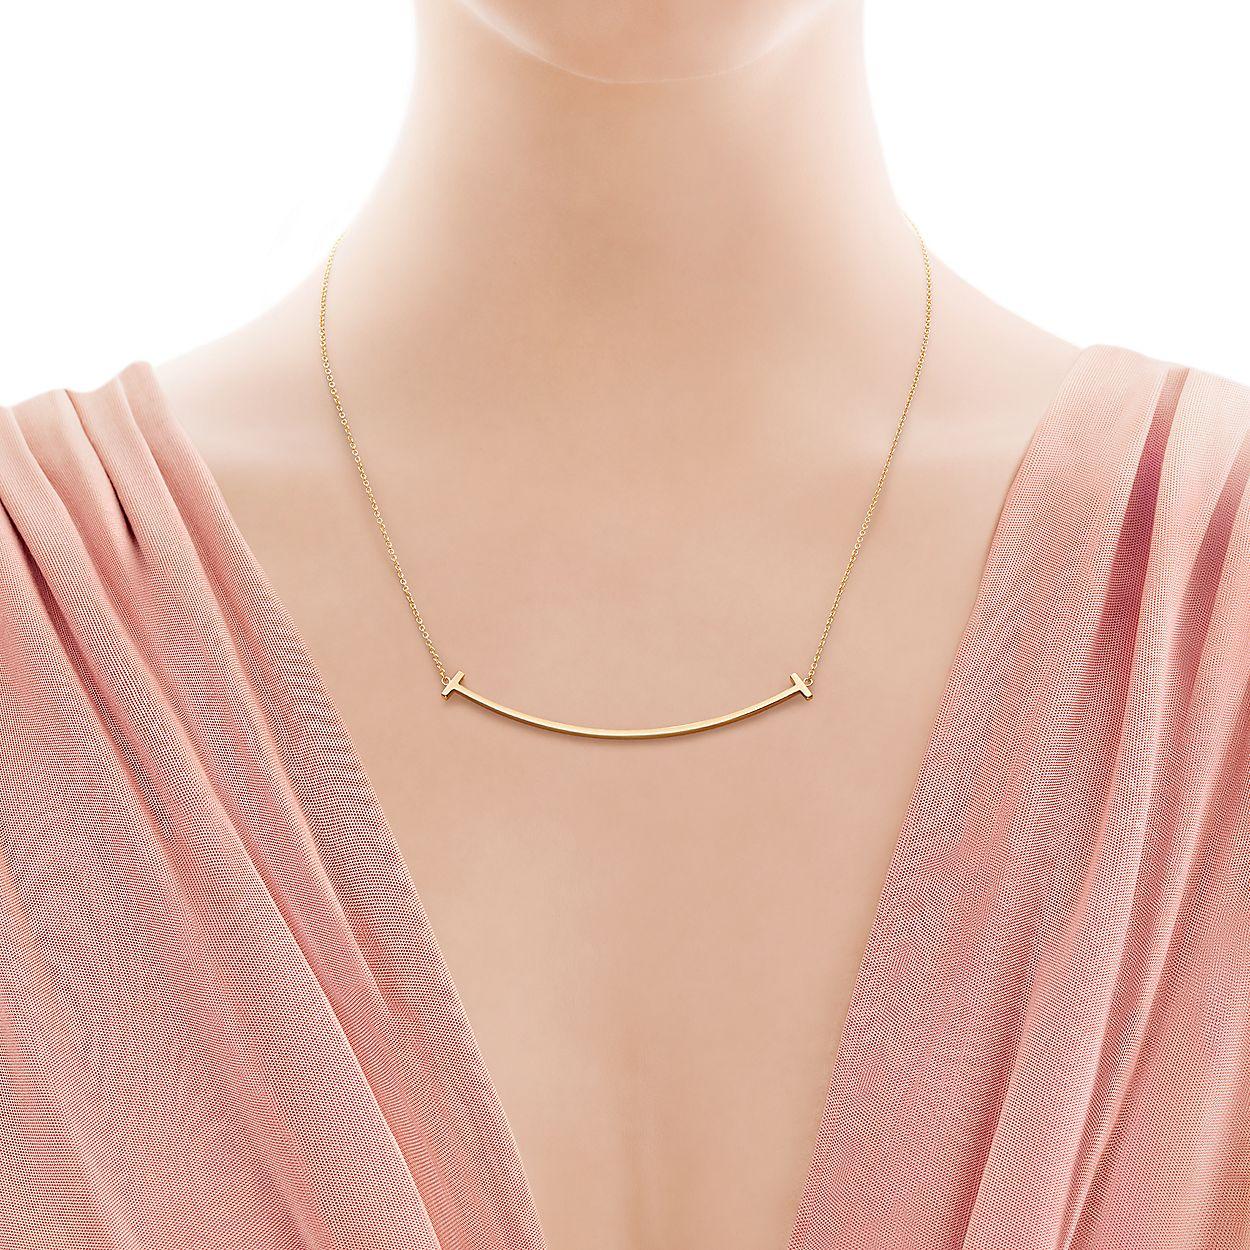 290acf91f 18K Gold Smile Pendant Necklace | Tiffany & Co.